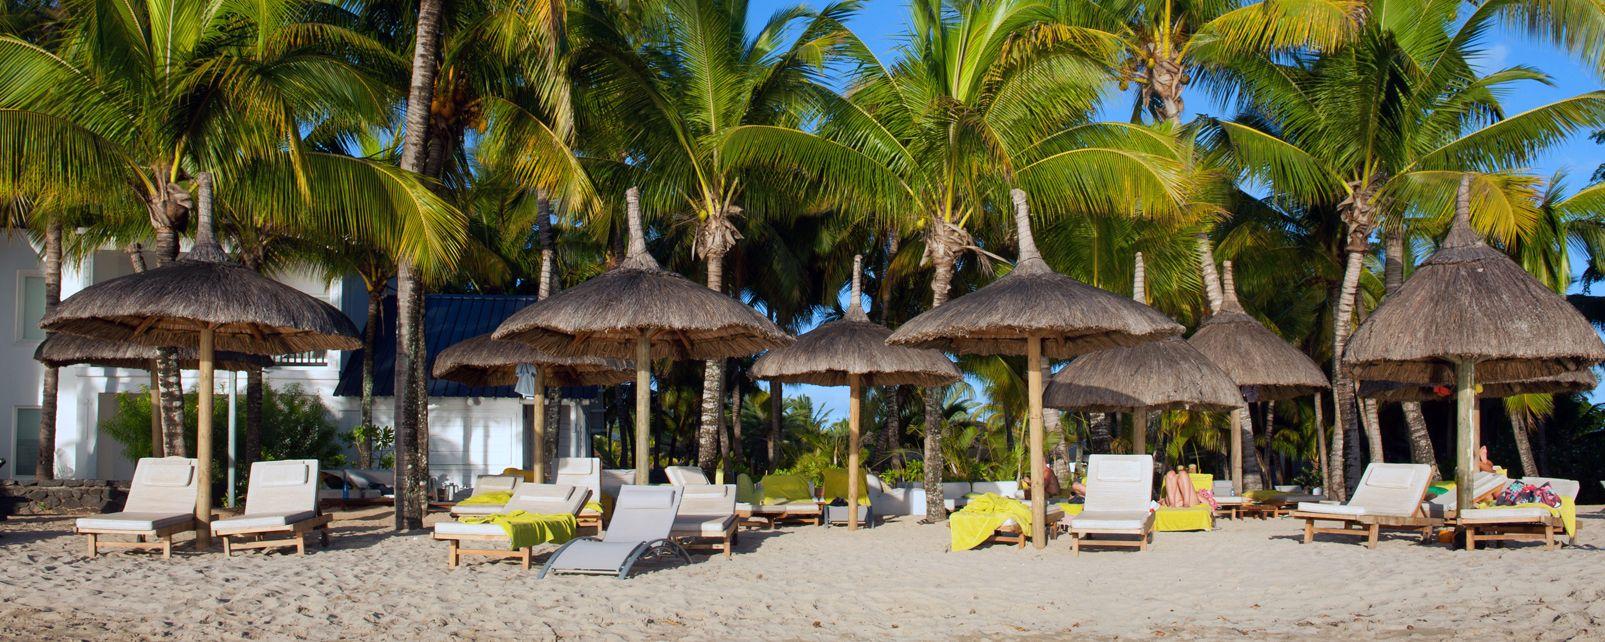 Hôtel La Plantation Resort & Spa